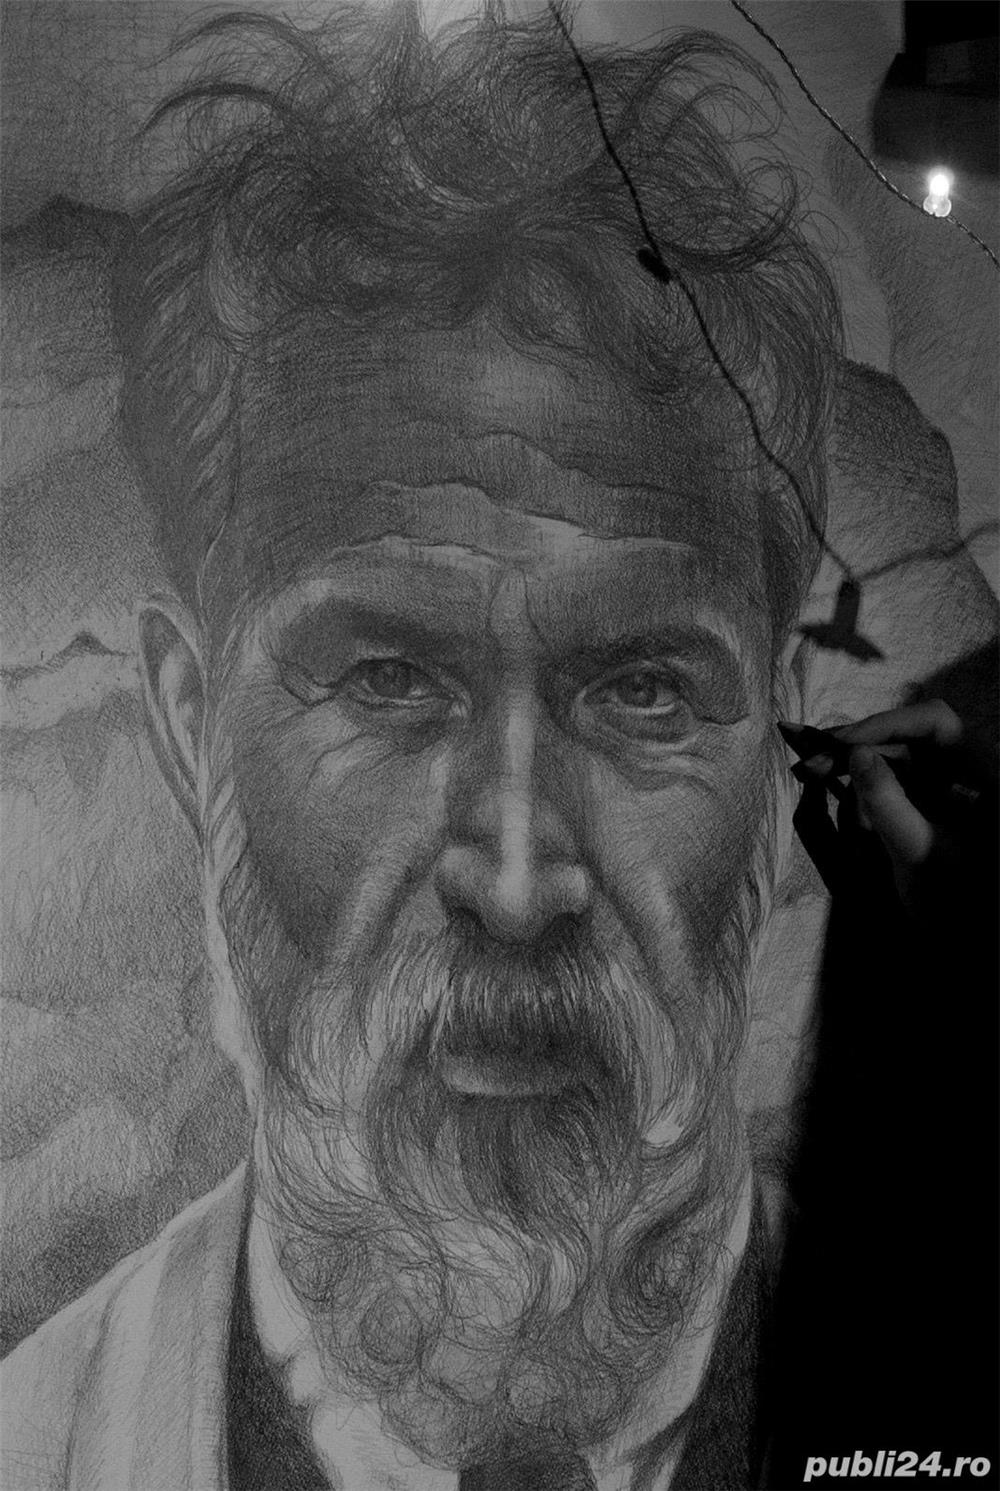 Portrete realiste dupa poza